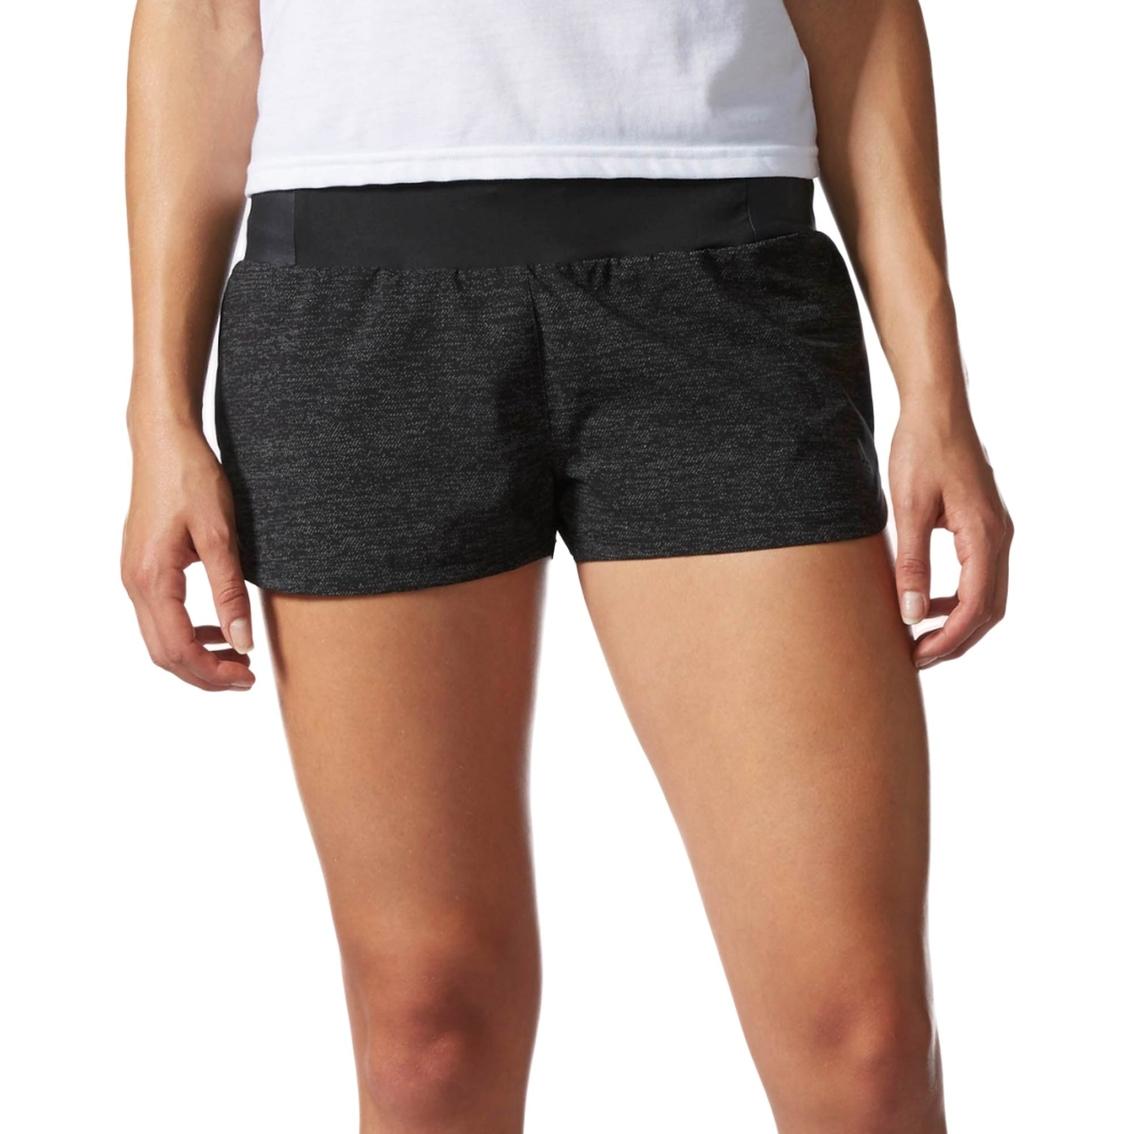 detergente saldar heroico  Adidas Supernova Glide Shorts | Shorts | Mother's Day Shop | Shop ...